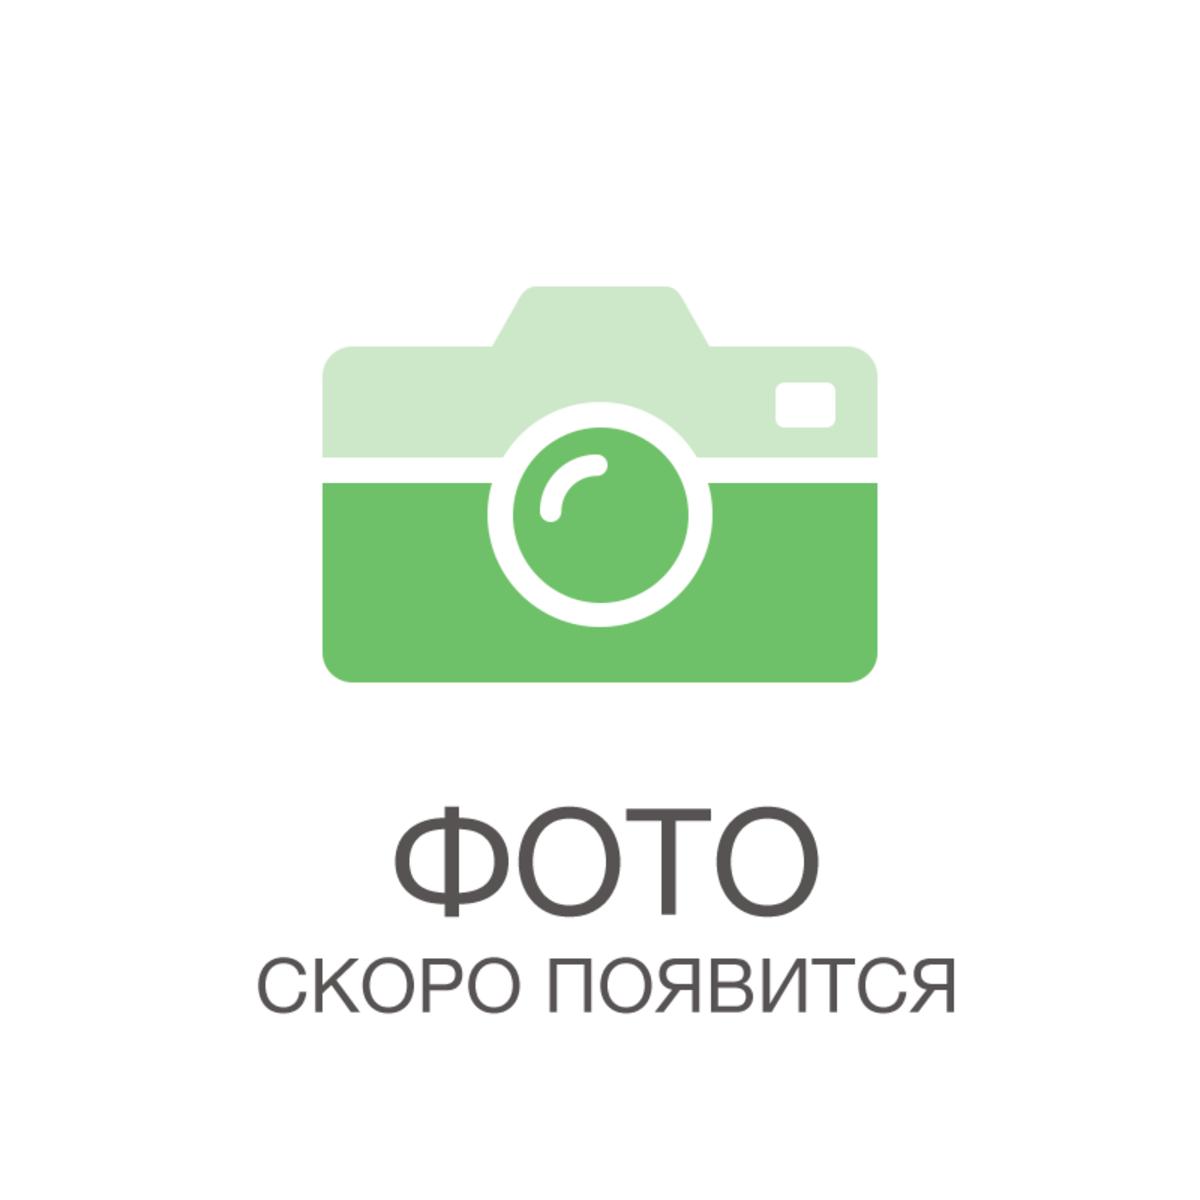 Затирка для узких швов Ceresit CE 33 Comfort ширина шва 2-6 мм 2 кг сталь цвет жасмин